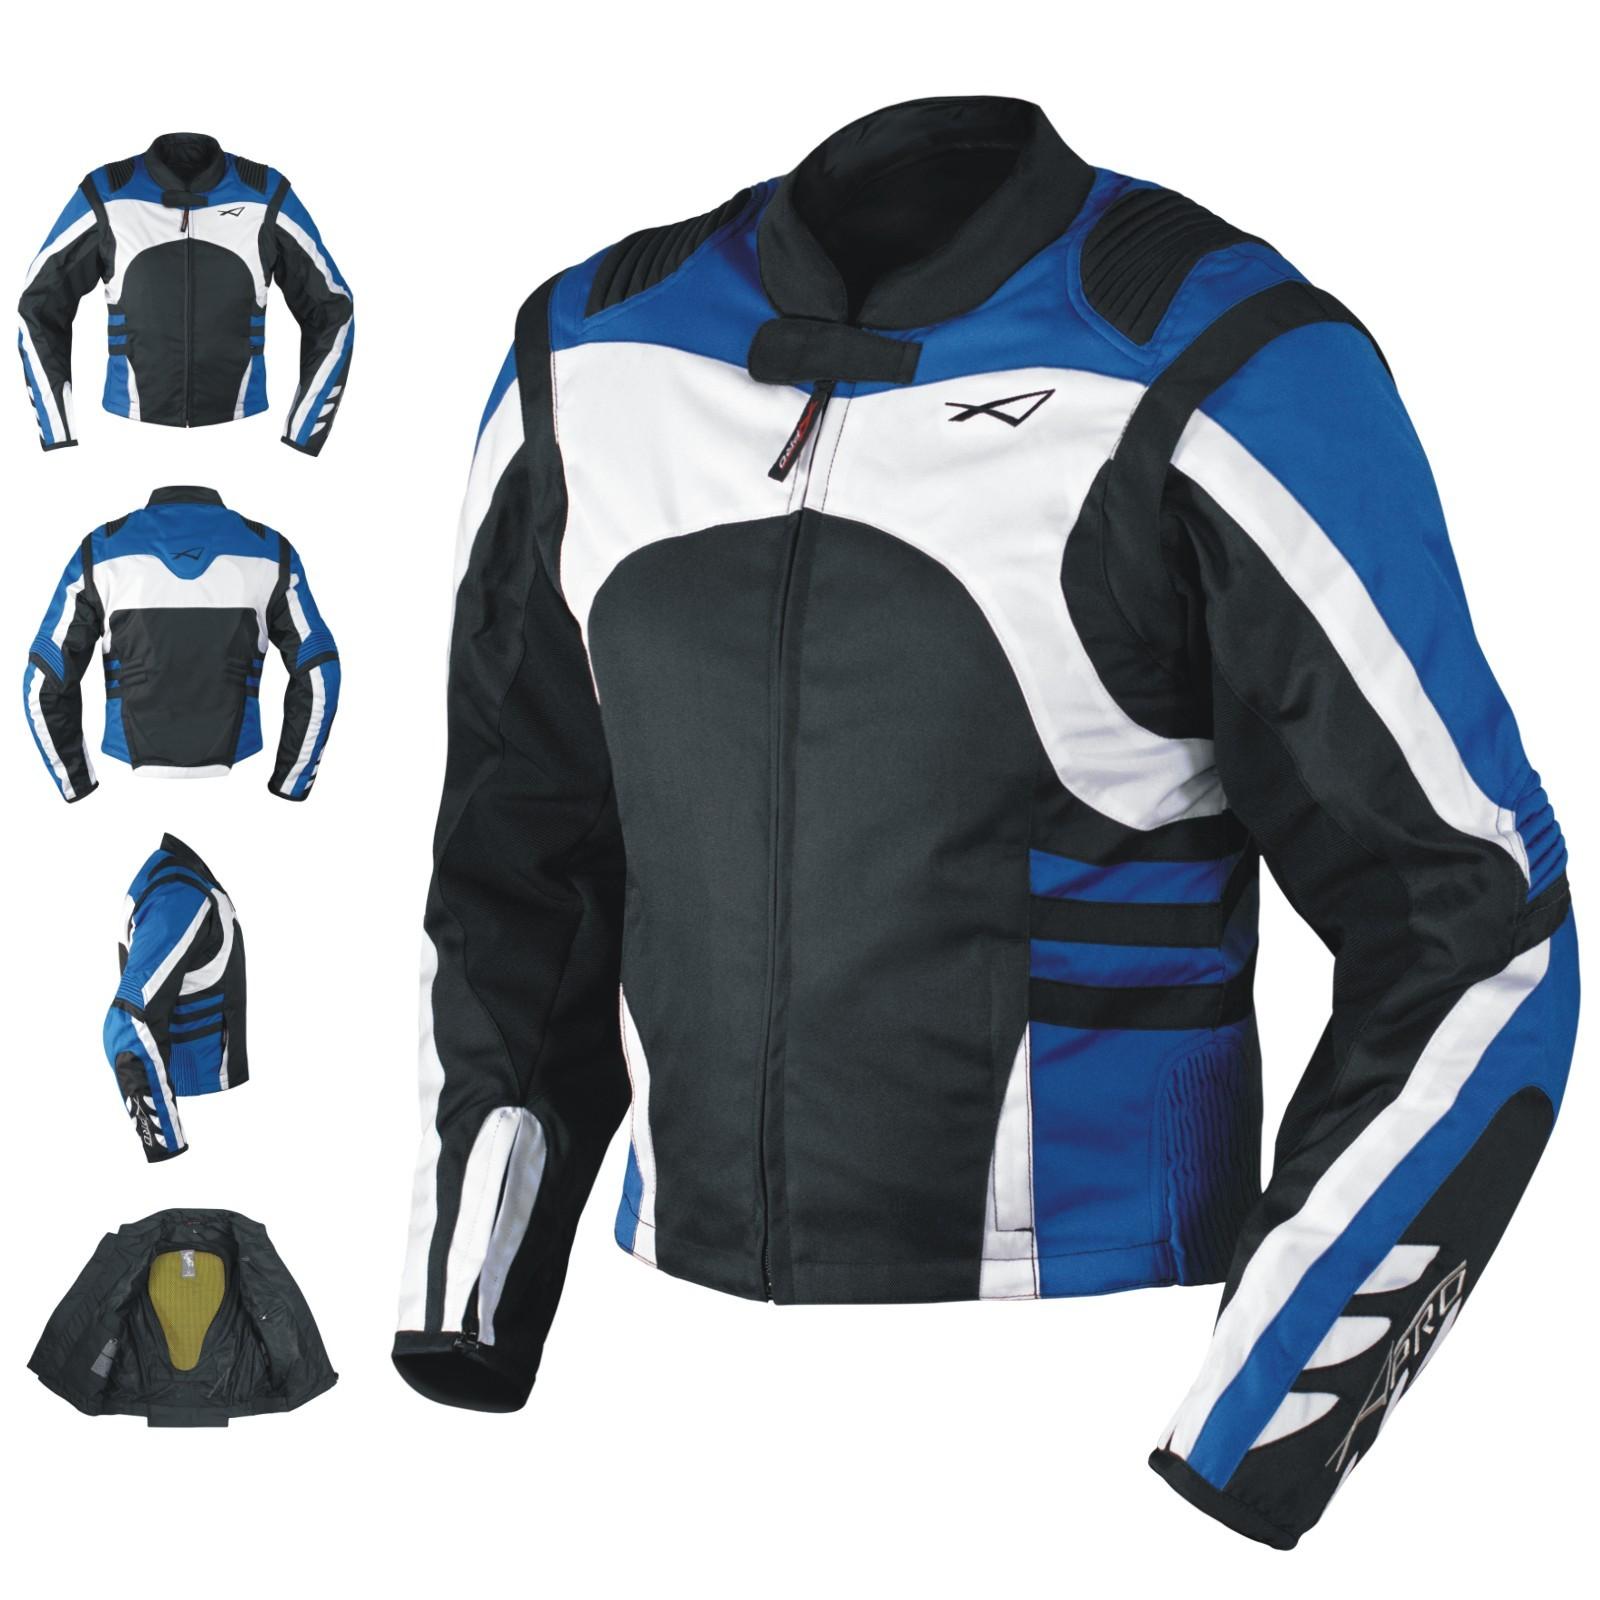 DYABLEX-A-Pro-Giacca-Jacket-Blu-Blue-Tessuto-Textile-Sonic-Moto